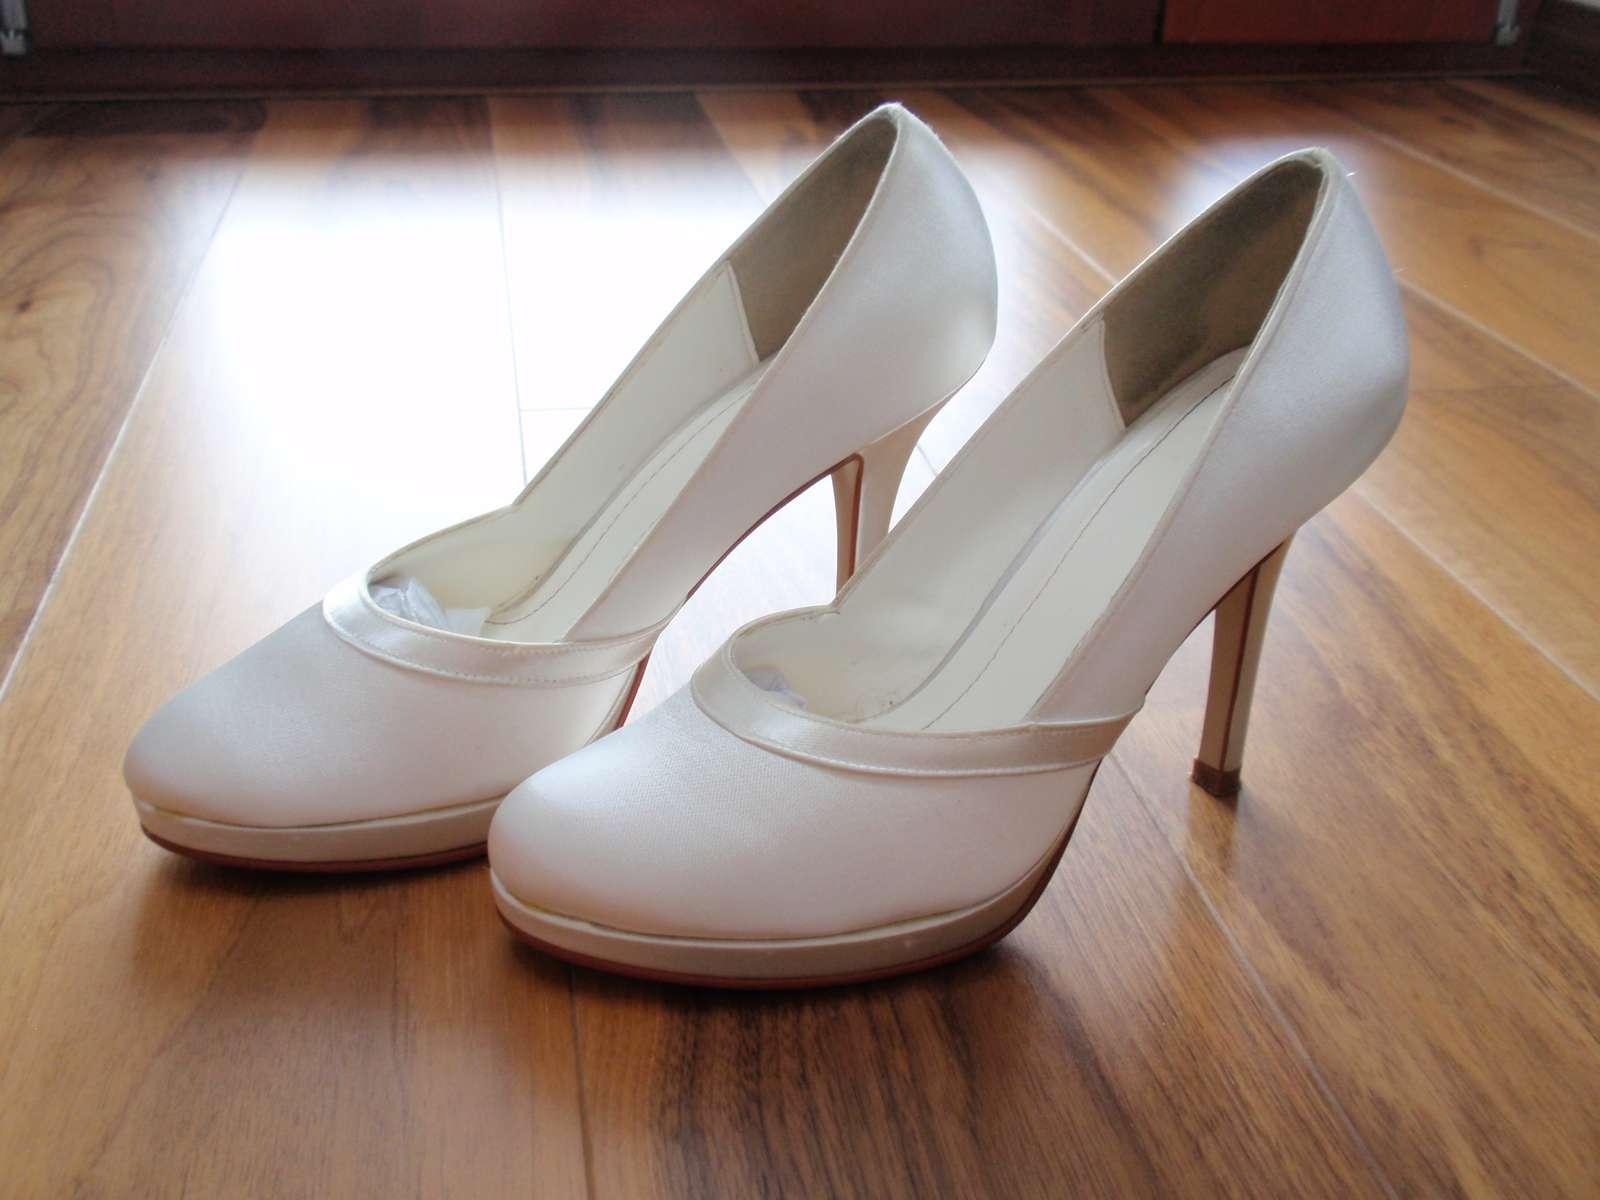 0445ae3fac1 Dámské svatební boty merlot